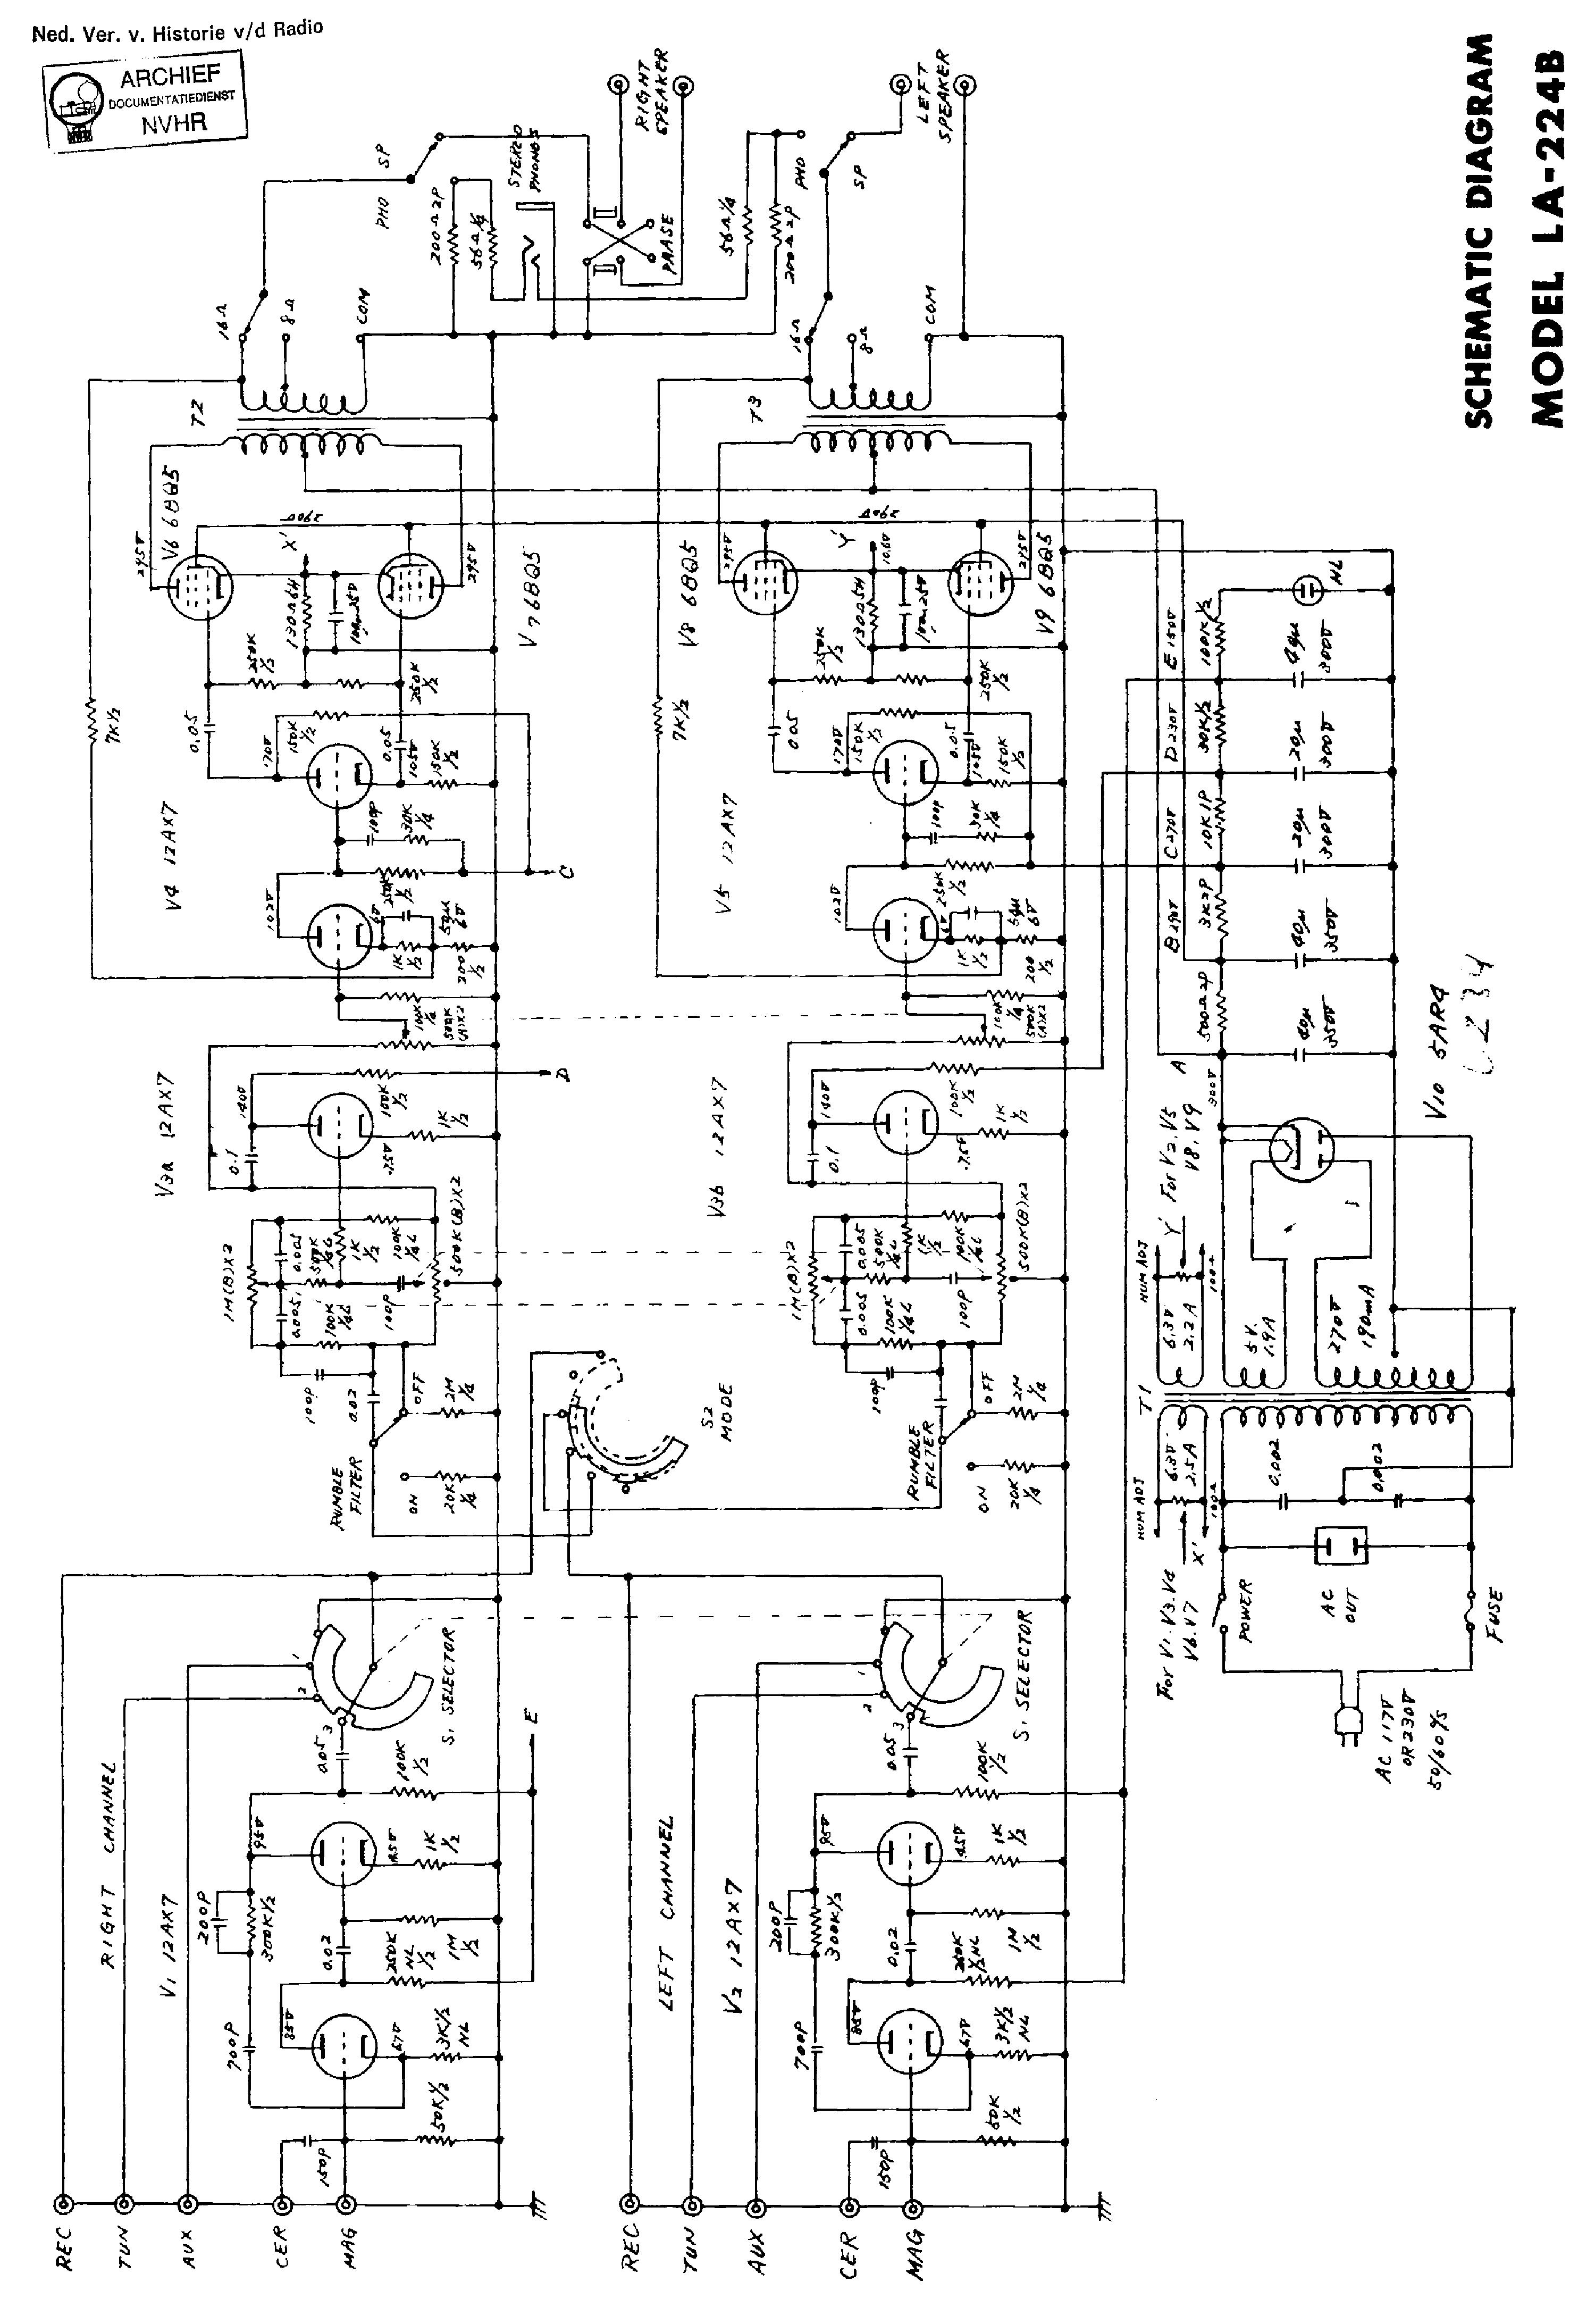 medium resolution of lafayette la224b 4x6bq5 stereo amplifier sch service manual download schematics eeprom repair info for electronics experts